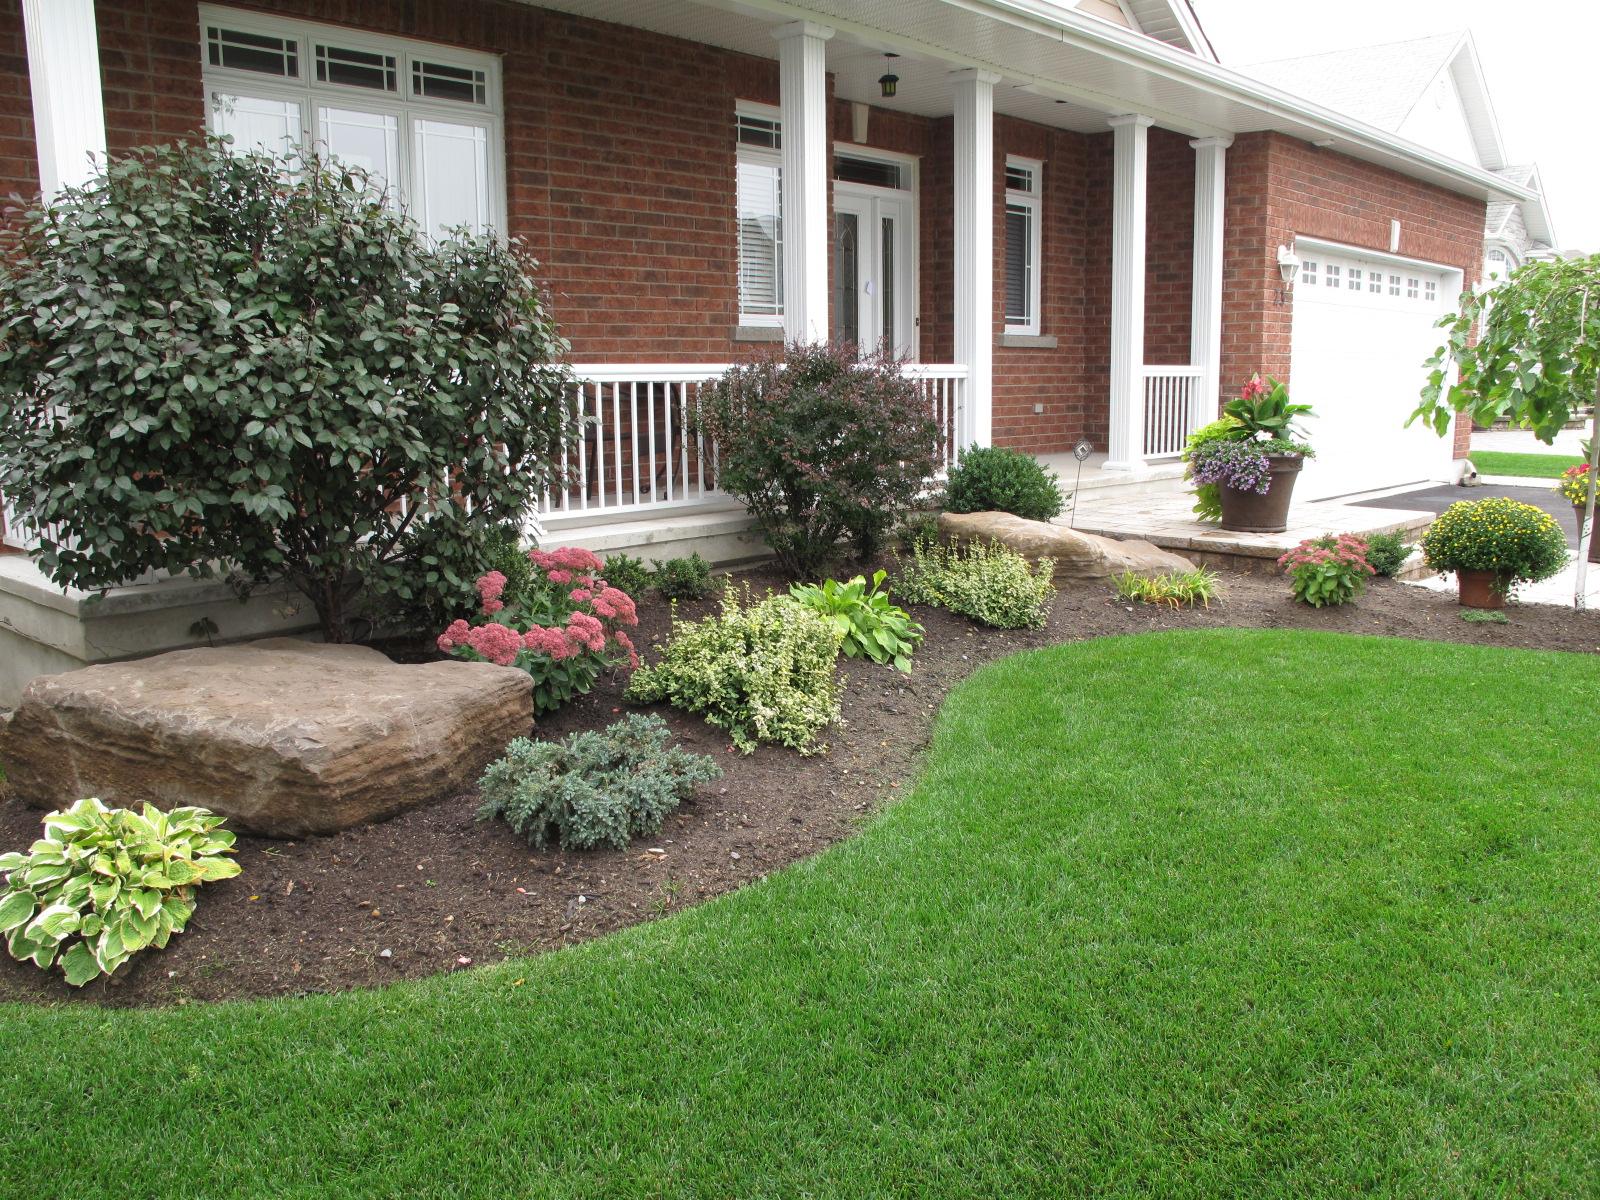 ottawa landscaping & interlock | ottawa home & garden